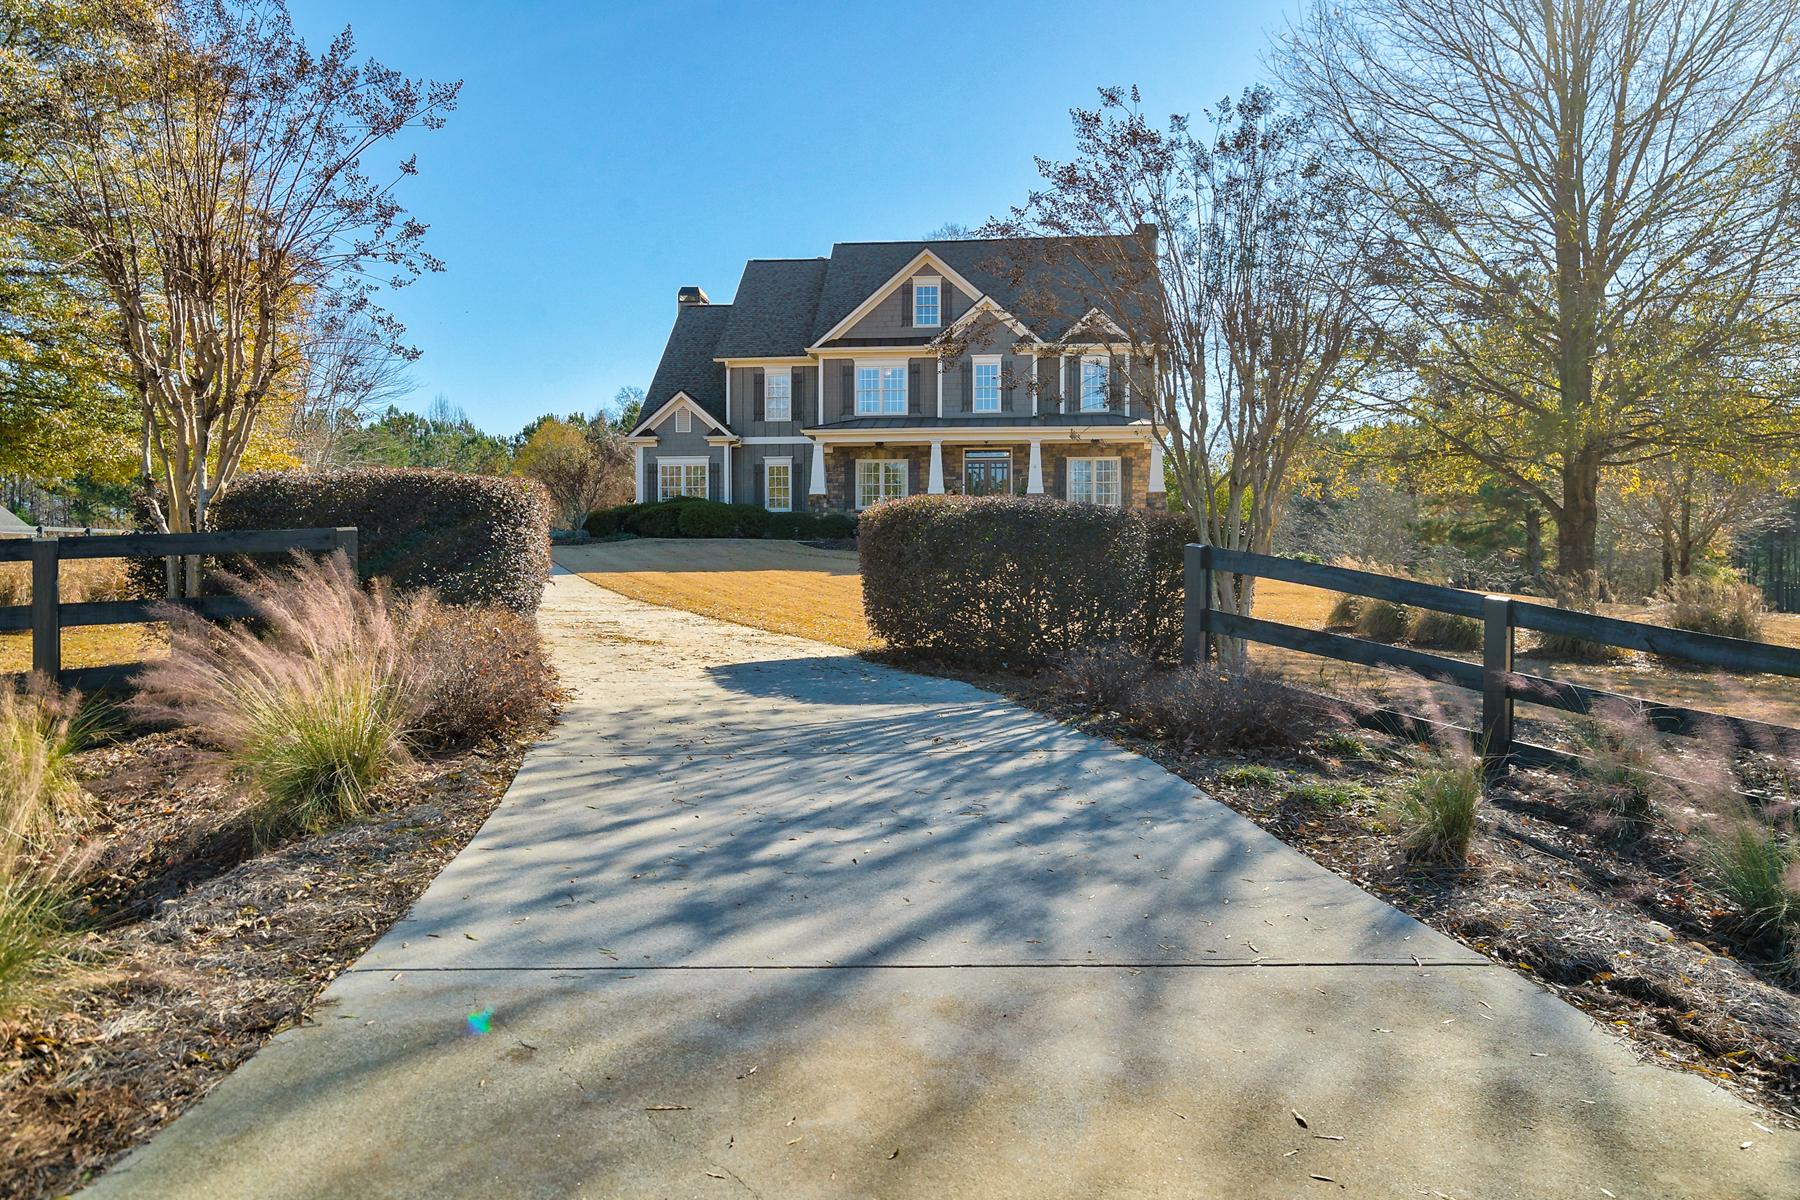 Single Family Home for Sale at Blue Ribbon Equestrian Estate 132 Savanna Estates Drive Canton, Georgia 30115 United States